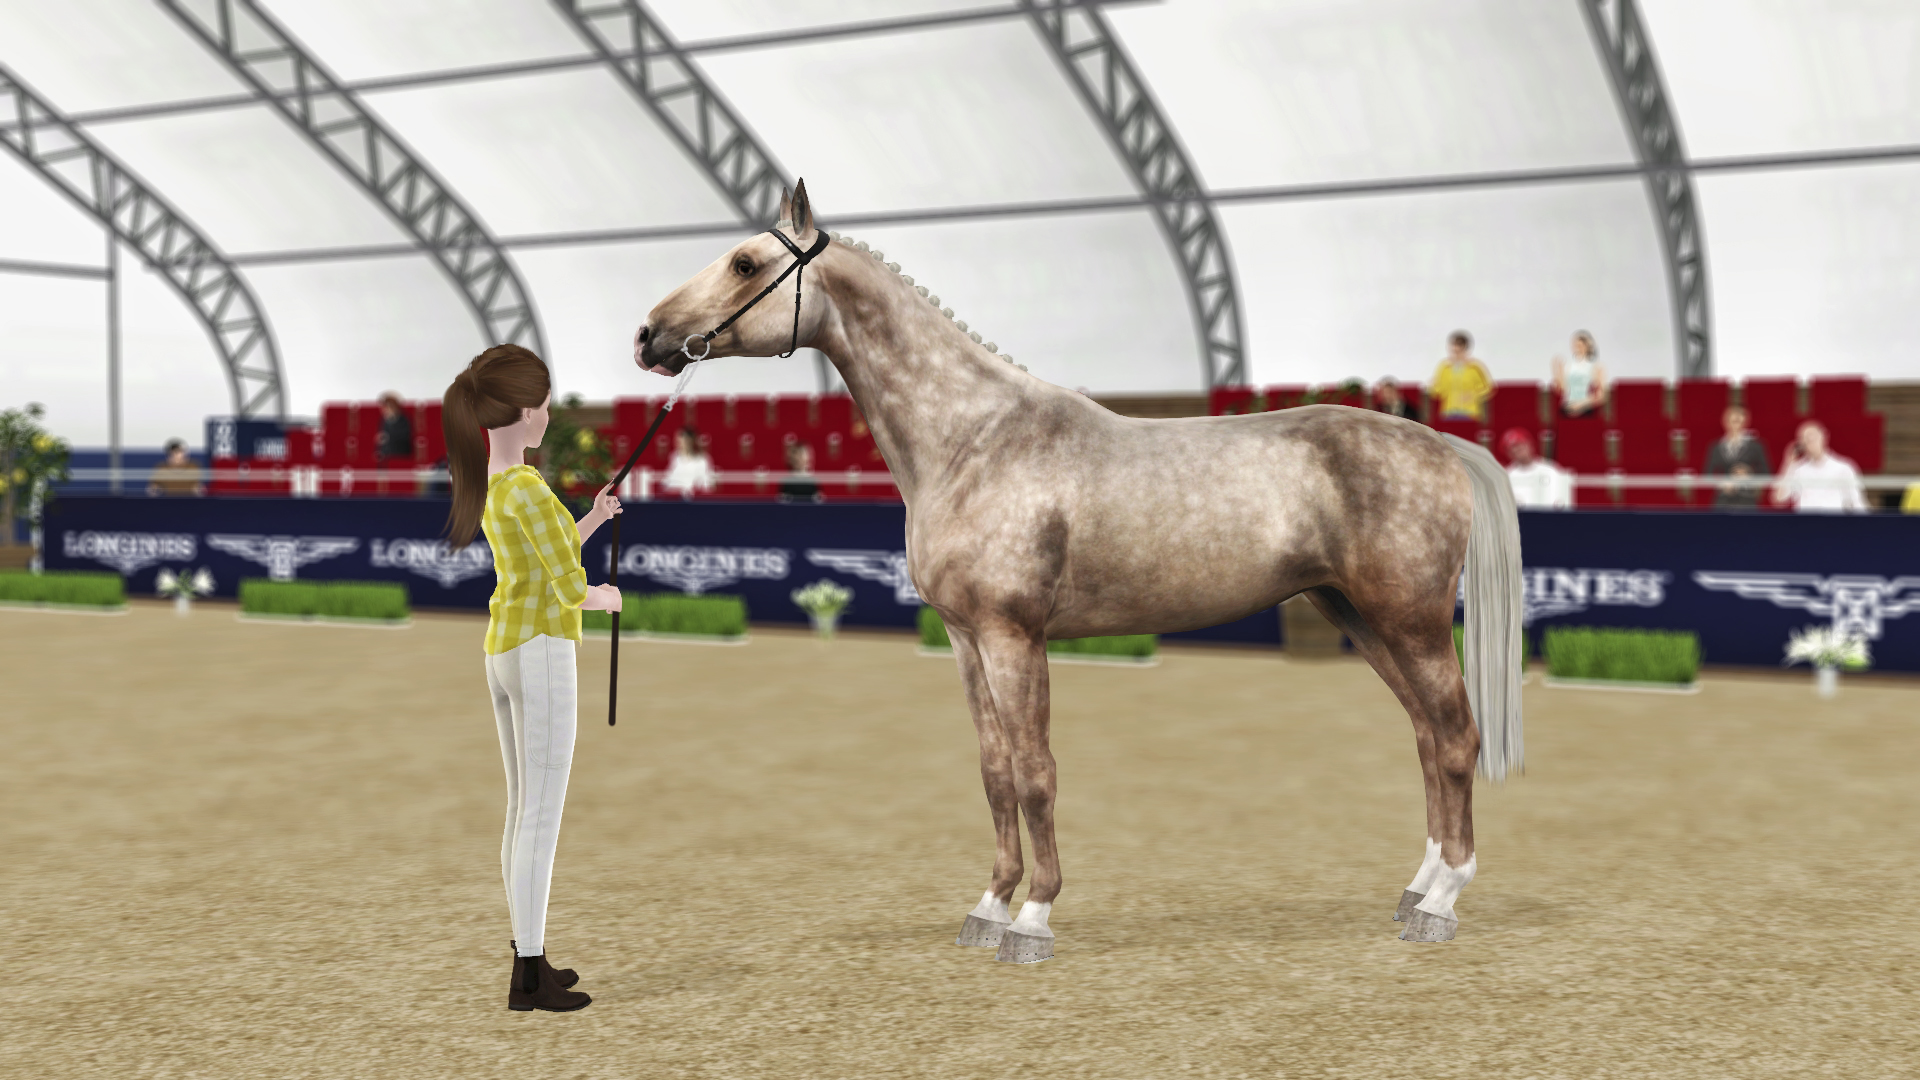 Регистрация лошадей в RHF 2 - Страница 8 0279e8ecc105cab3a1fd788a3d9ee022